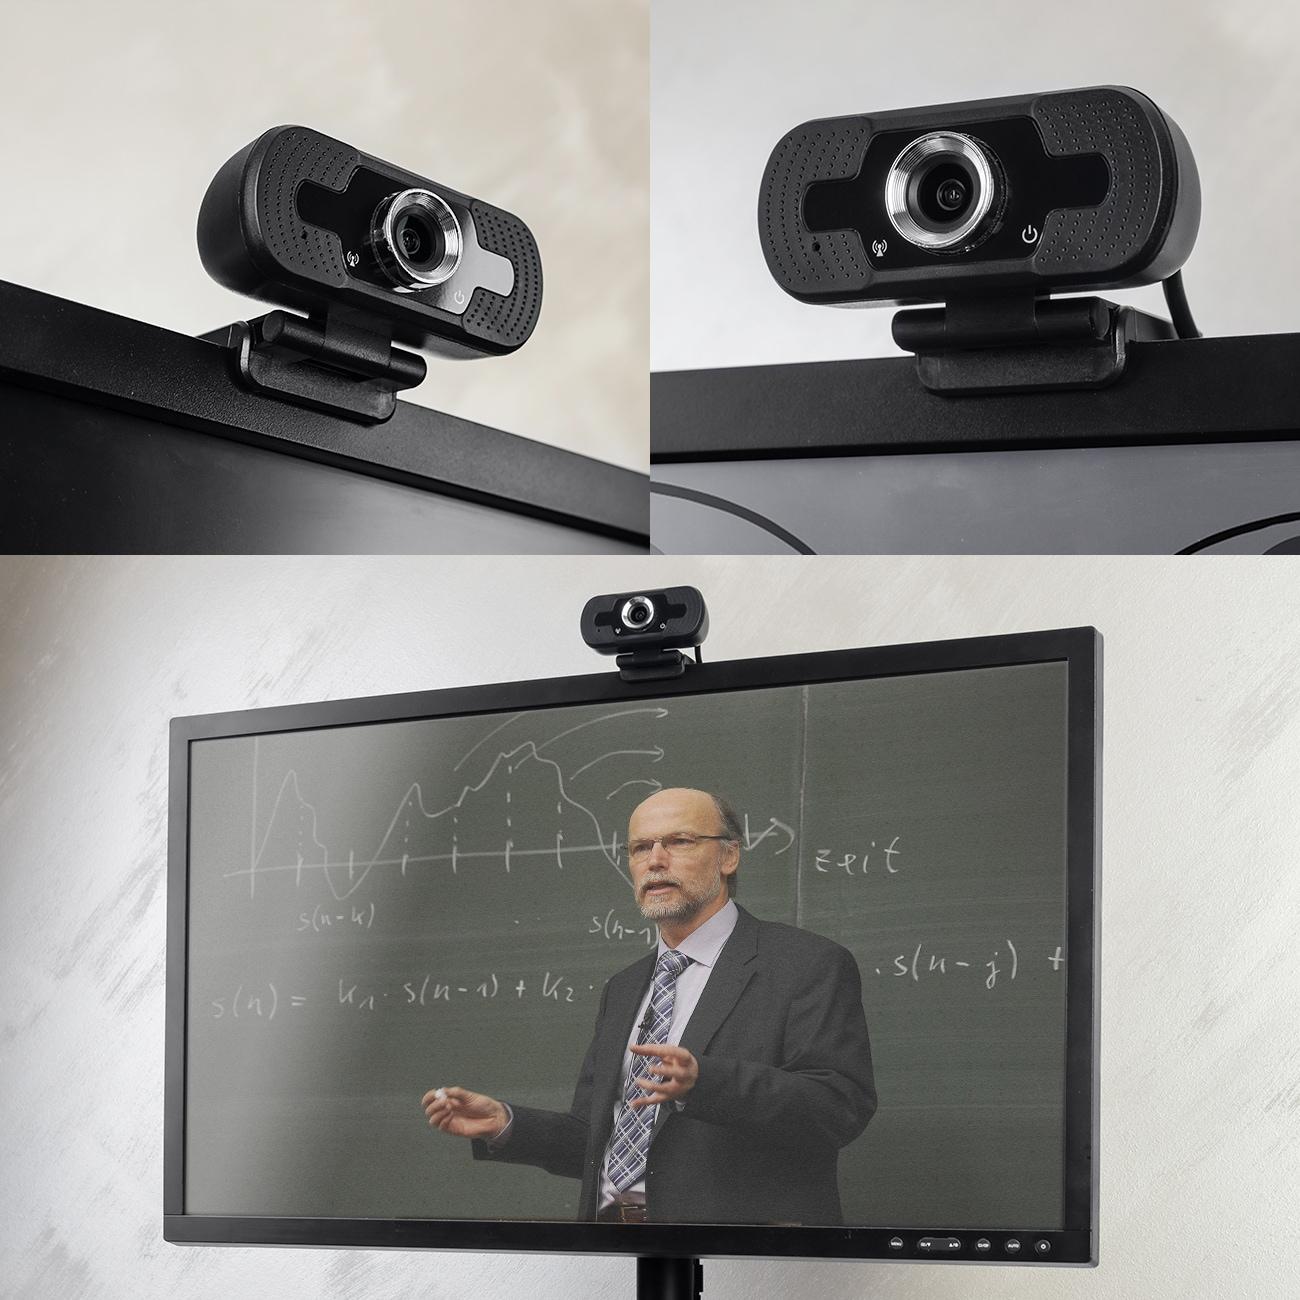 Webcam for Streaming Microphone Camera USB FHD SP-WCAM01 - 9